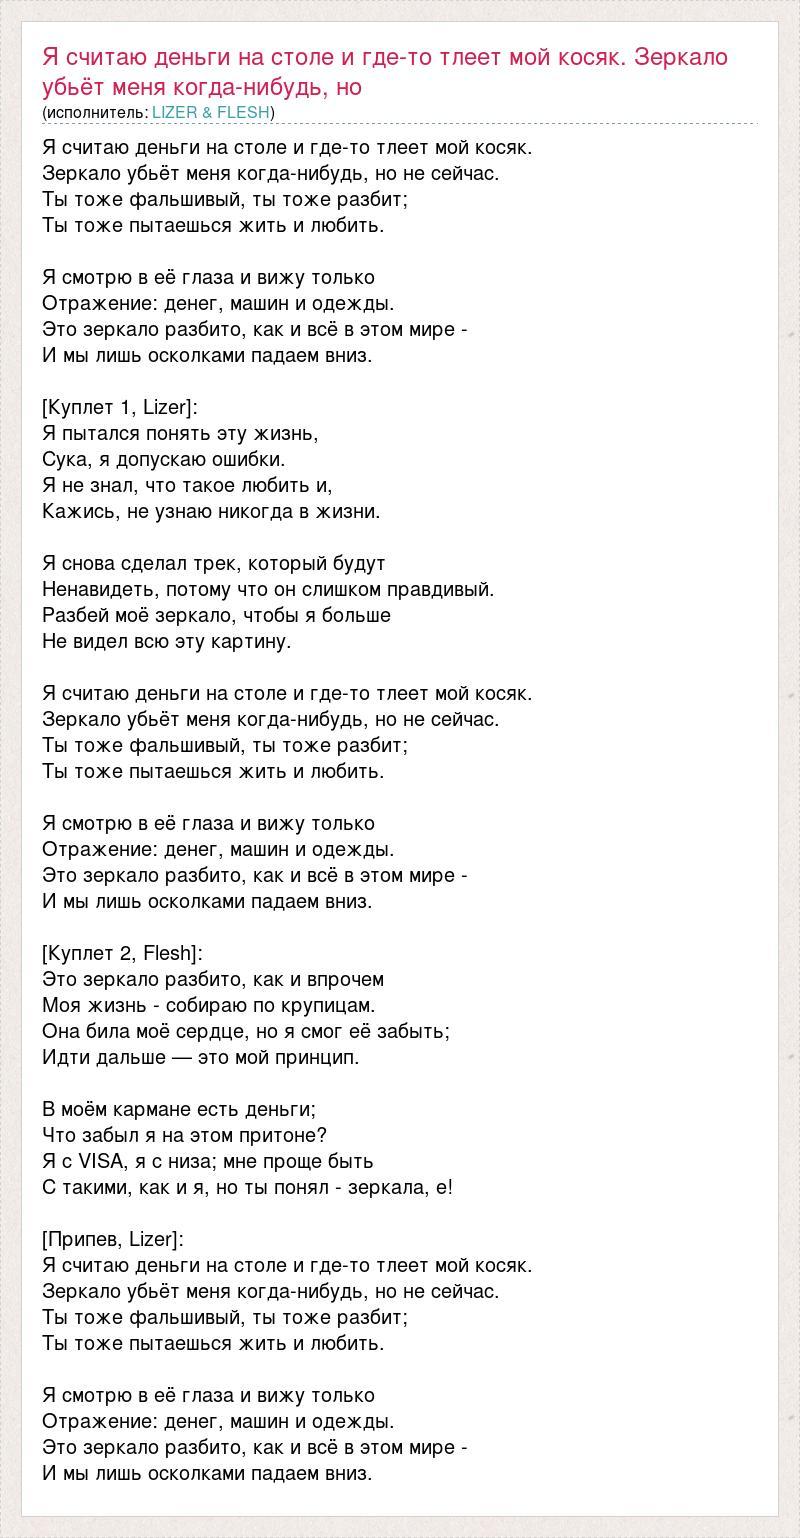 Ахеджакова, Лия Меджидовна Википедия 25